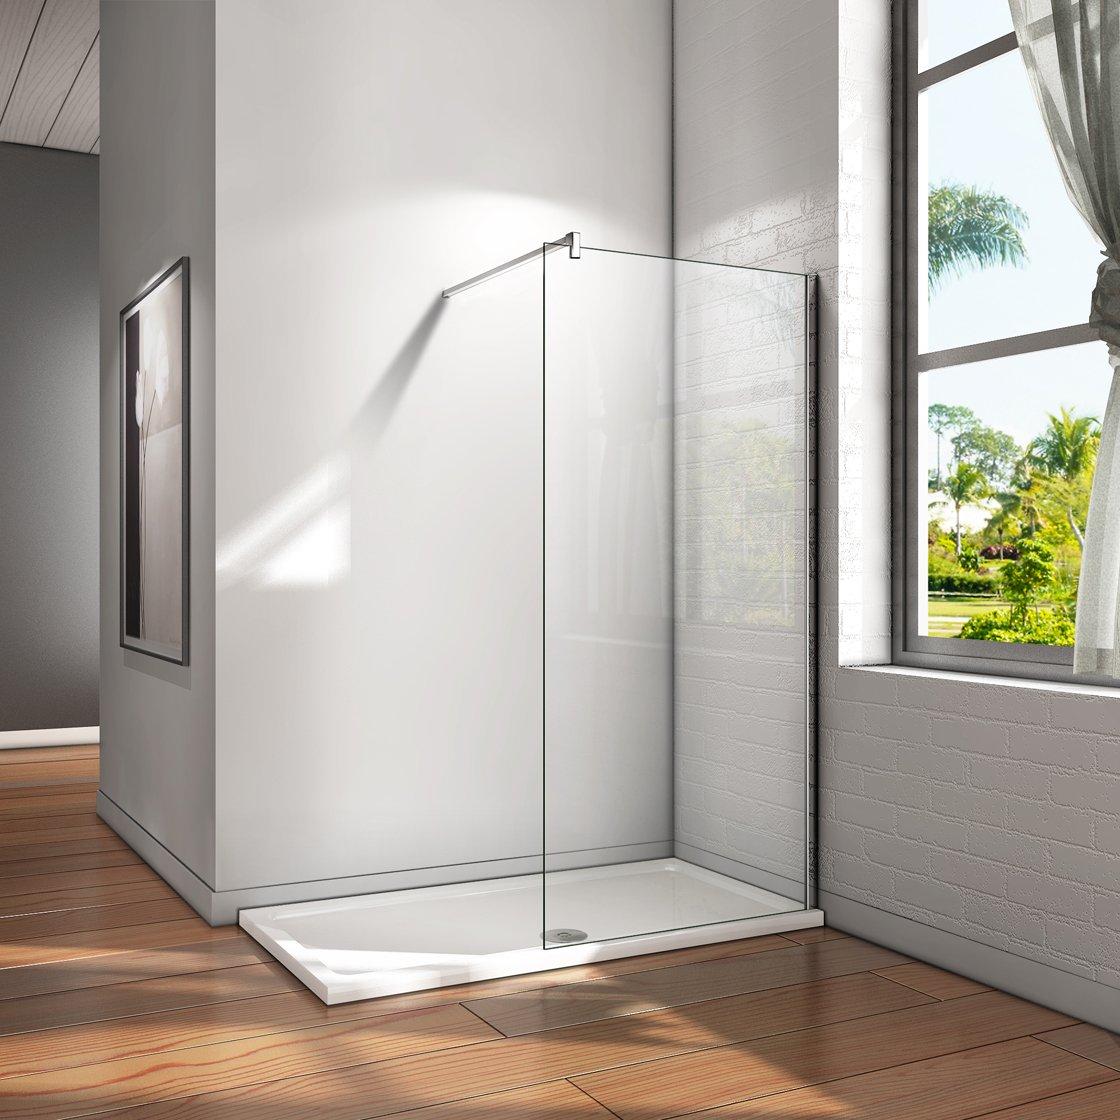 110x200cm Mamparas ducha Panel Pantalla Fija cristal 10mm templado para ba/ño